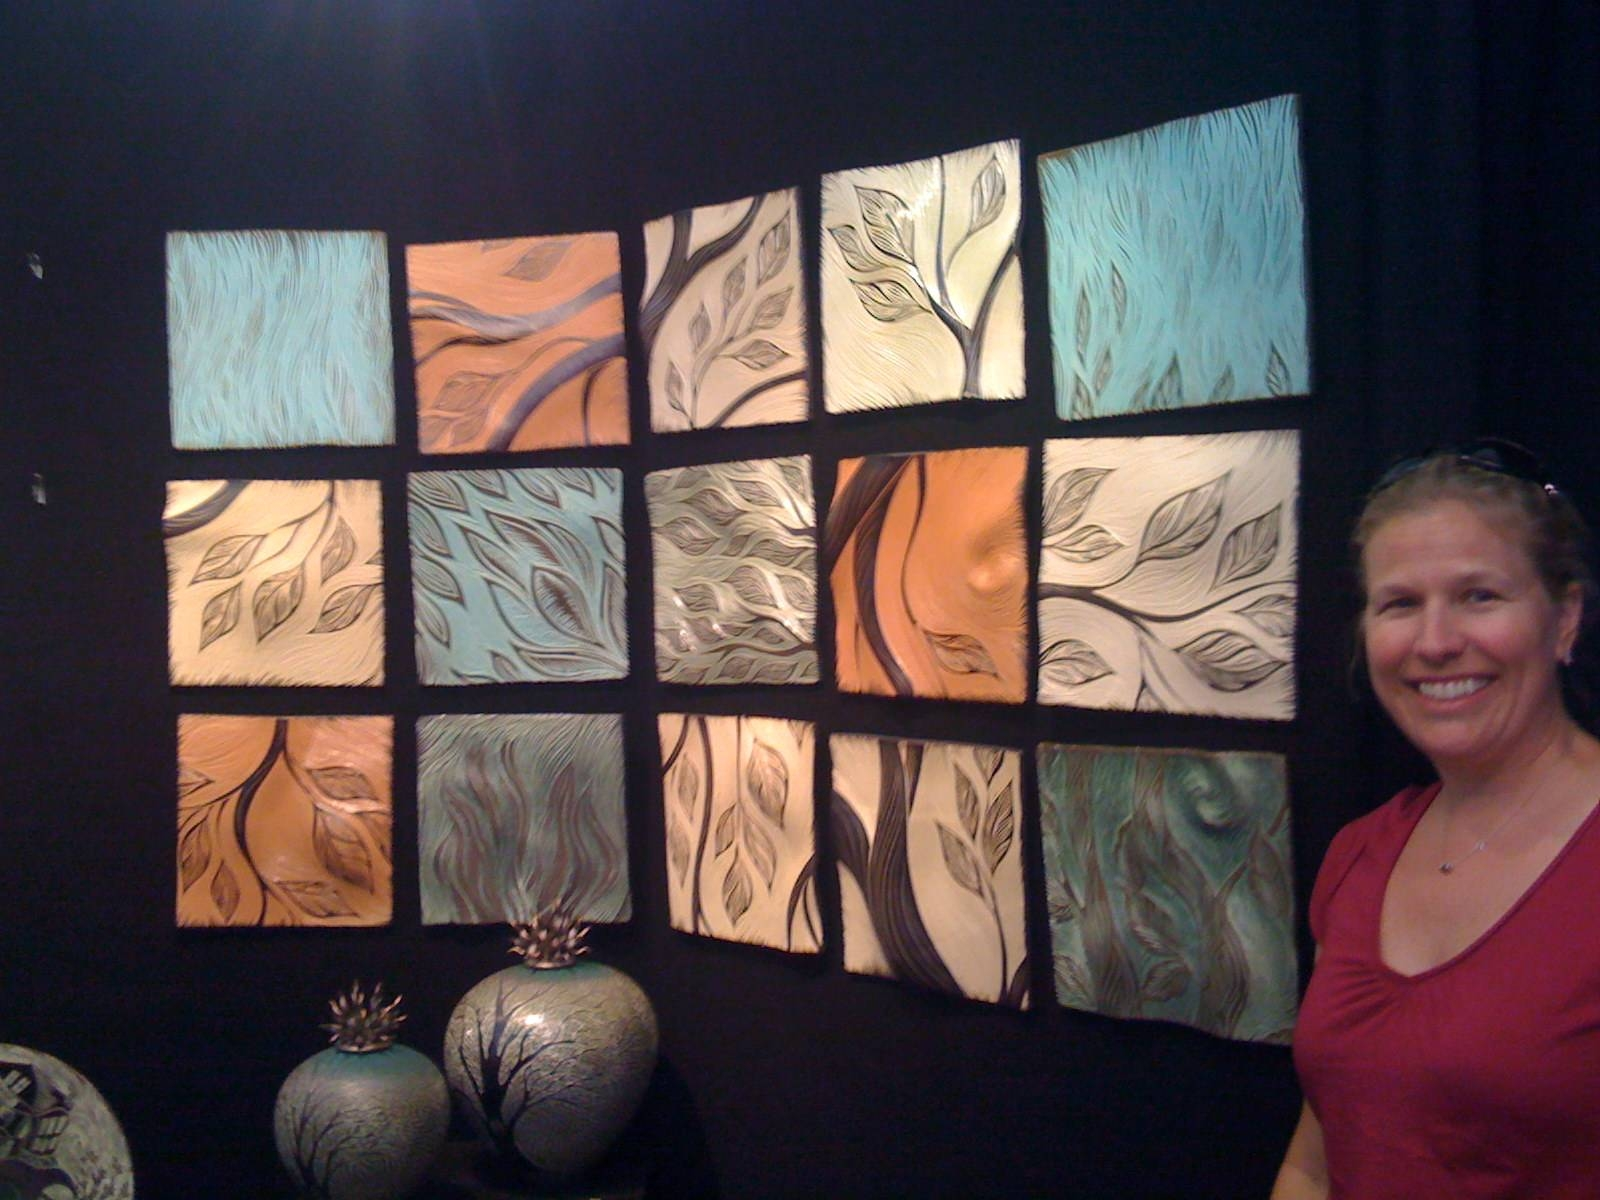 Ceramic Wall Tile Mural | Natalie Blake Studios Inside Newest Ceramic Tile Wall Art (View 15 of 20)